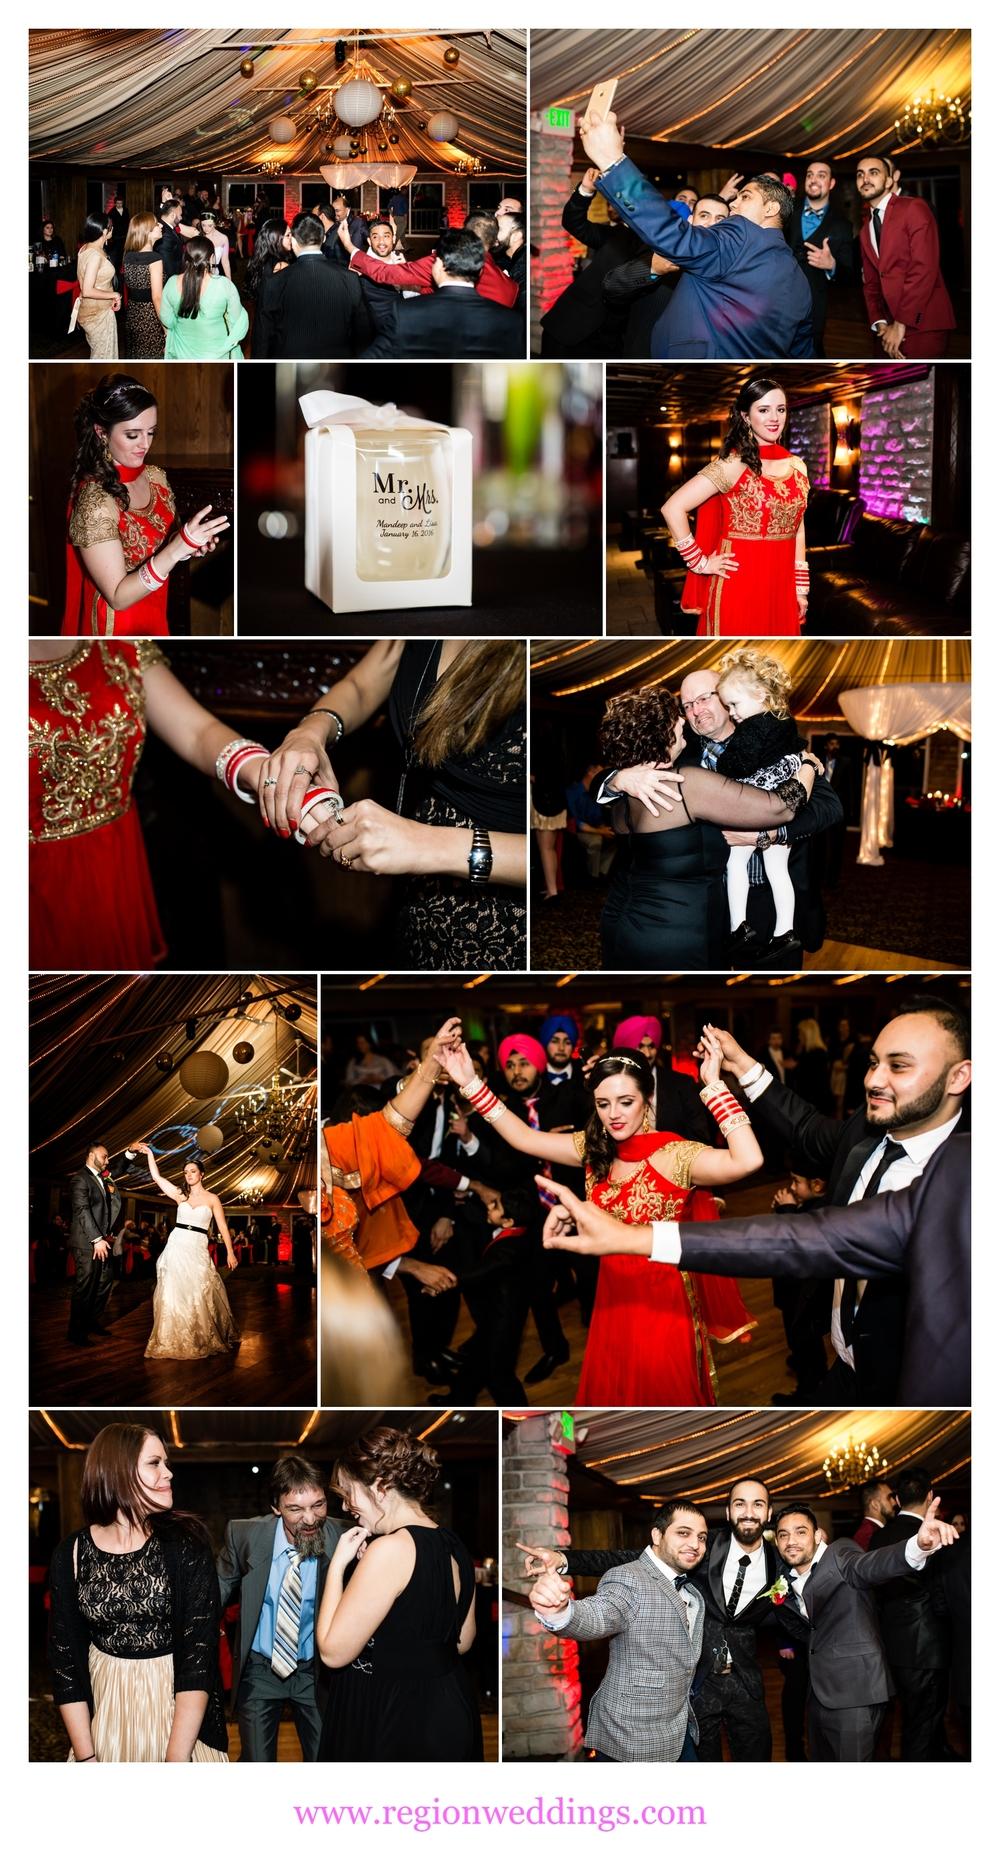 Reception photos of an Indian-American wedding.